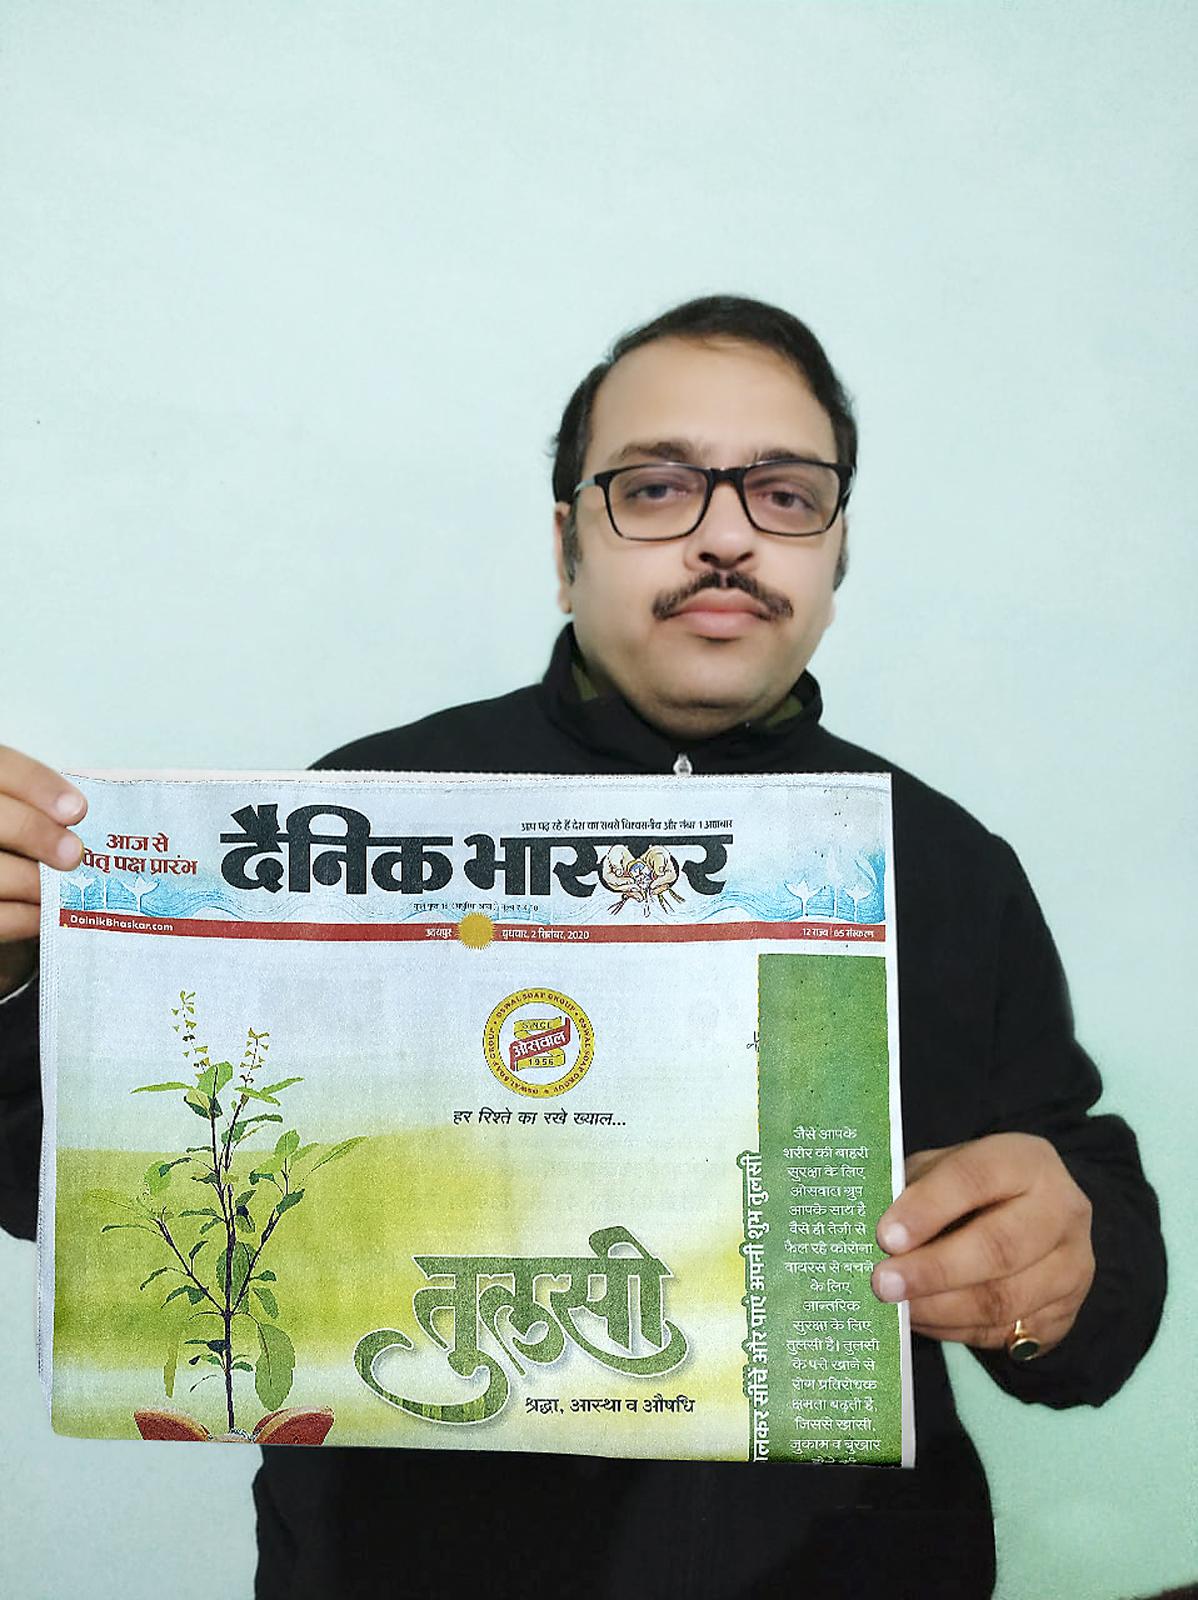 Tulsi Seed Innovation in newspaper